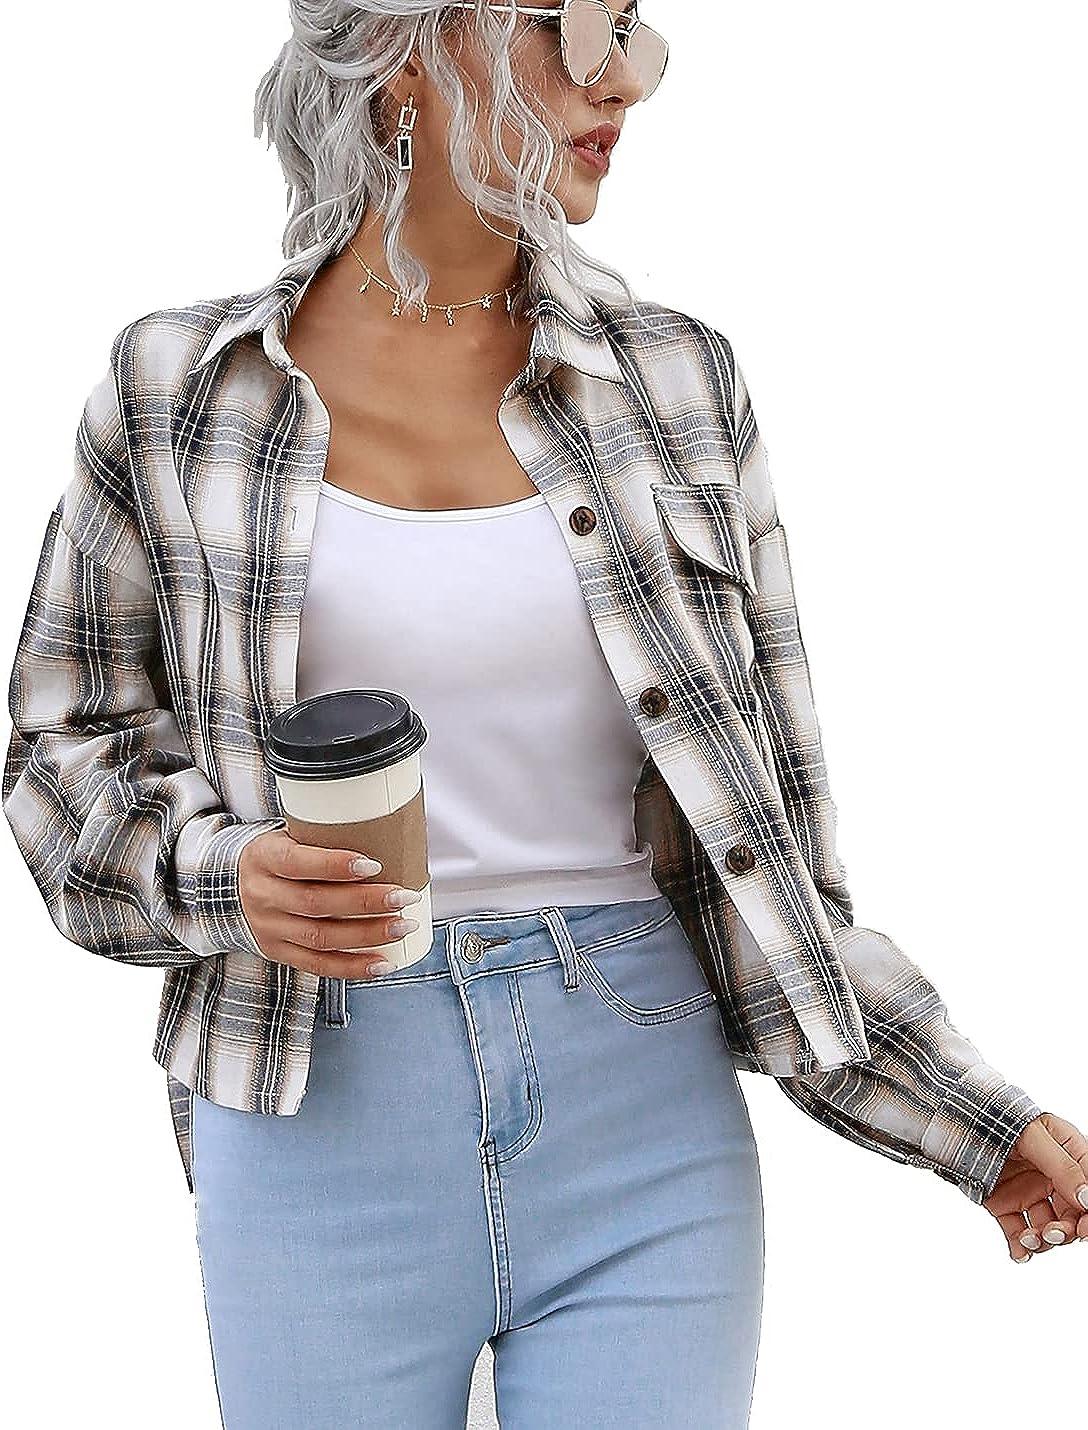 Xishiloft Womens Casual Plaid Shirt Button Down Tops Irregular Hem Blouse Shirts